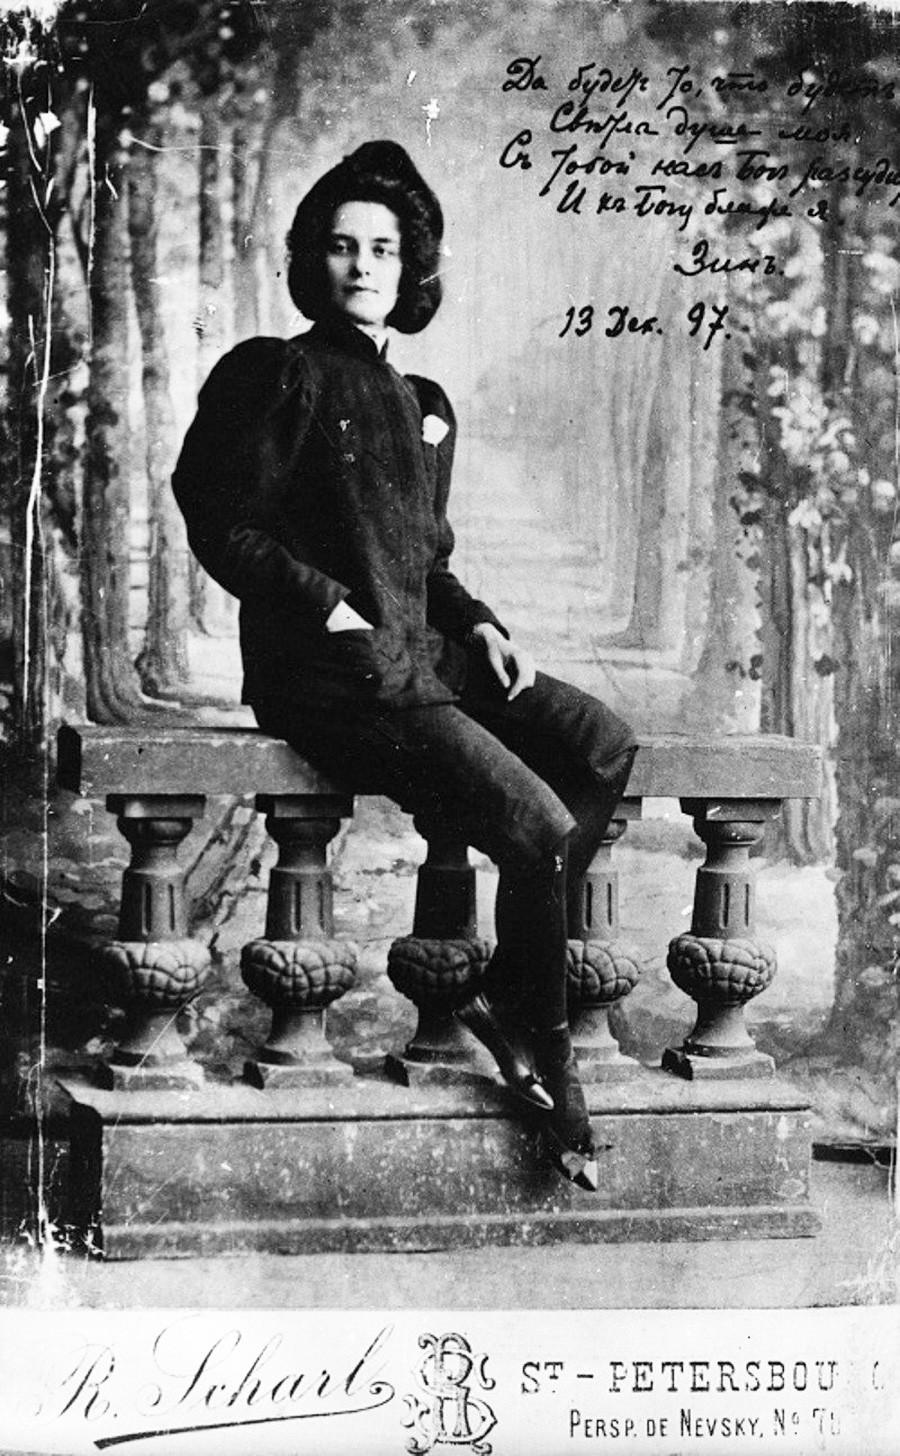 Gippius, 13 December 1897